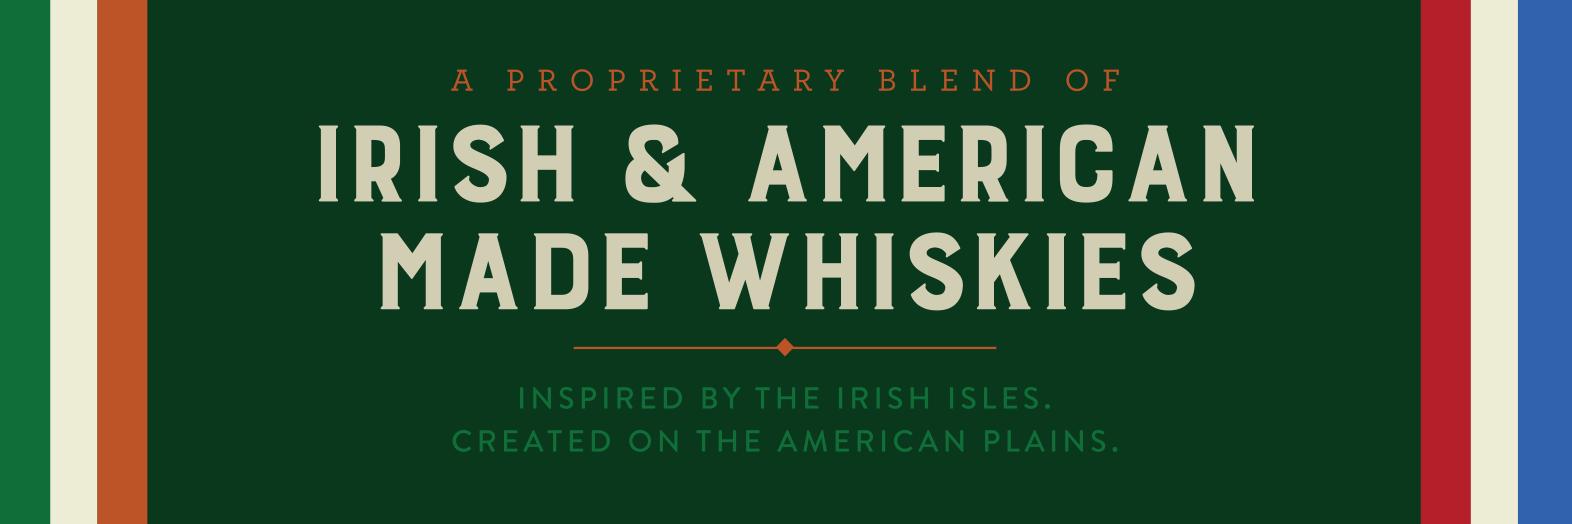 A Proprietary Blend of Irish & American Made Whiskies